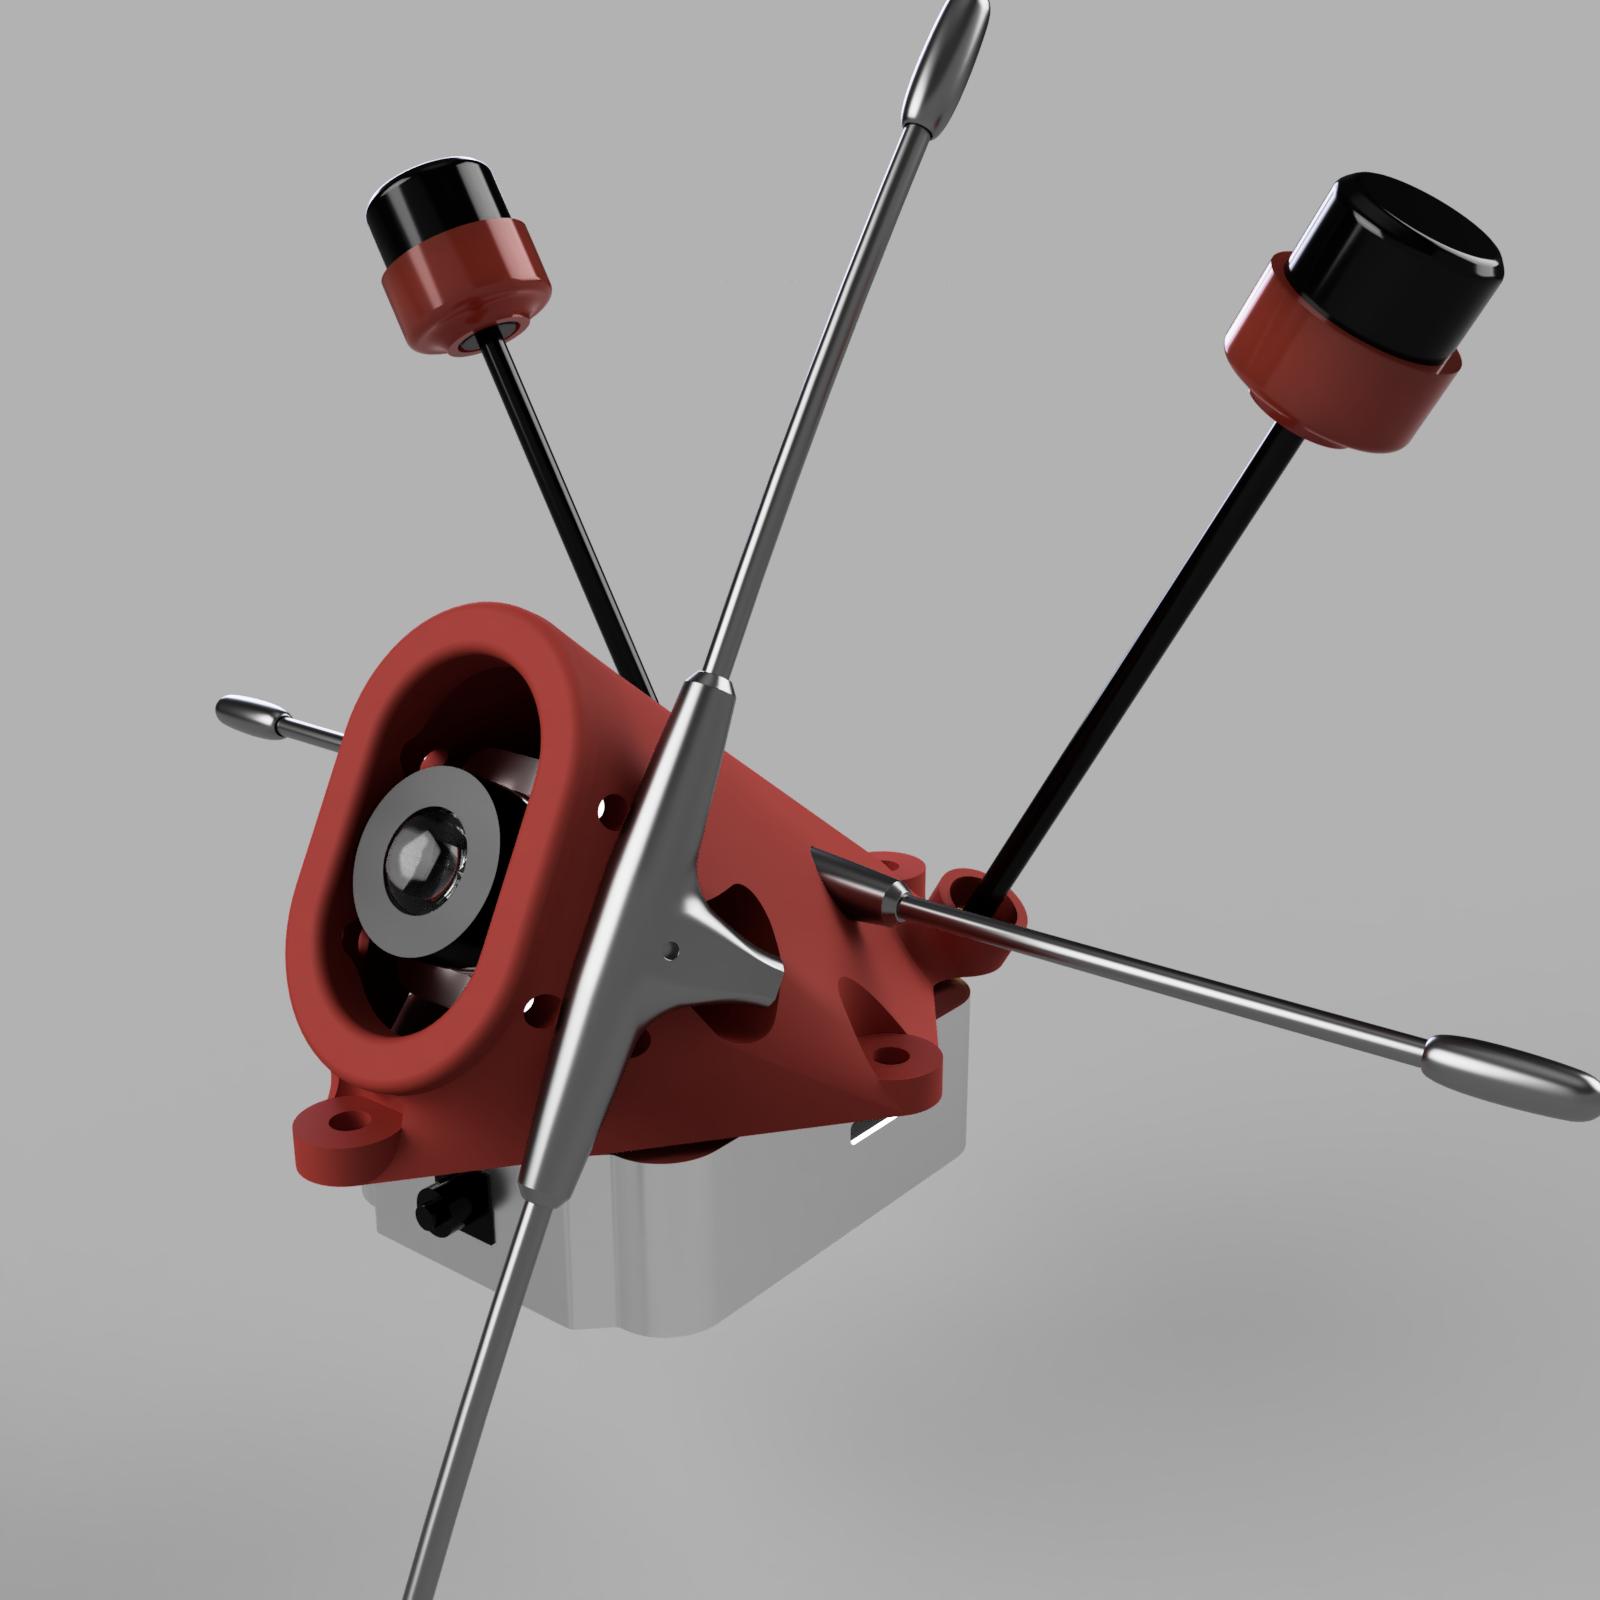 Flying Fox Canopy for DJI Air Unit